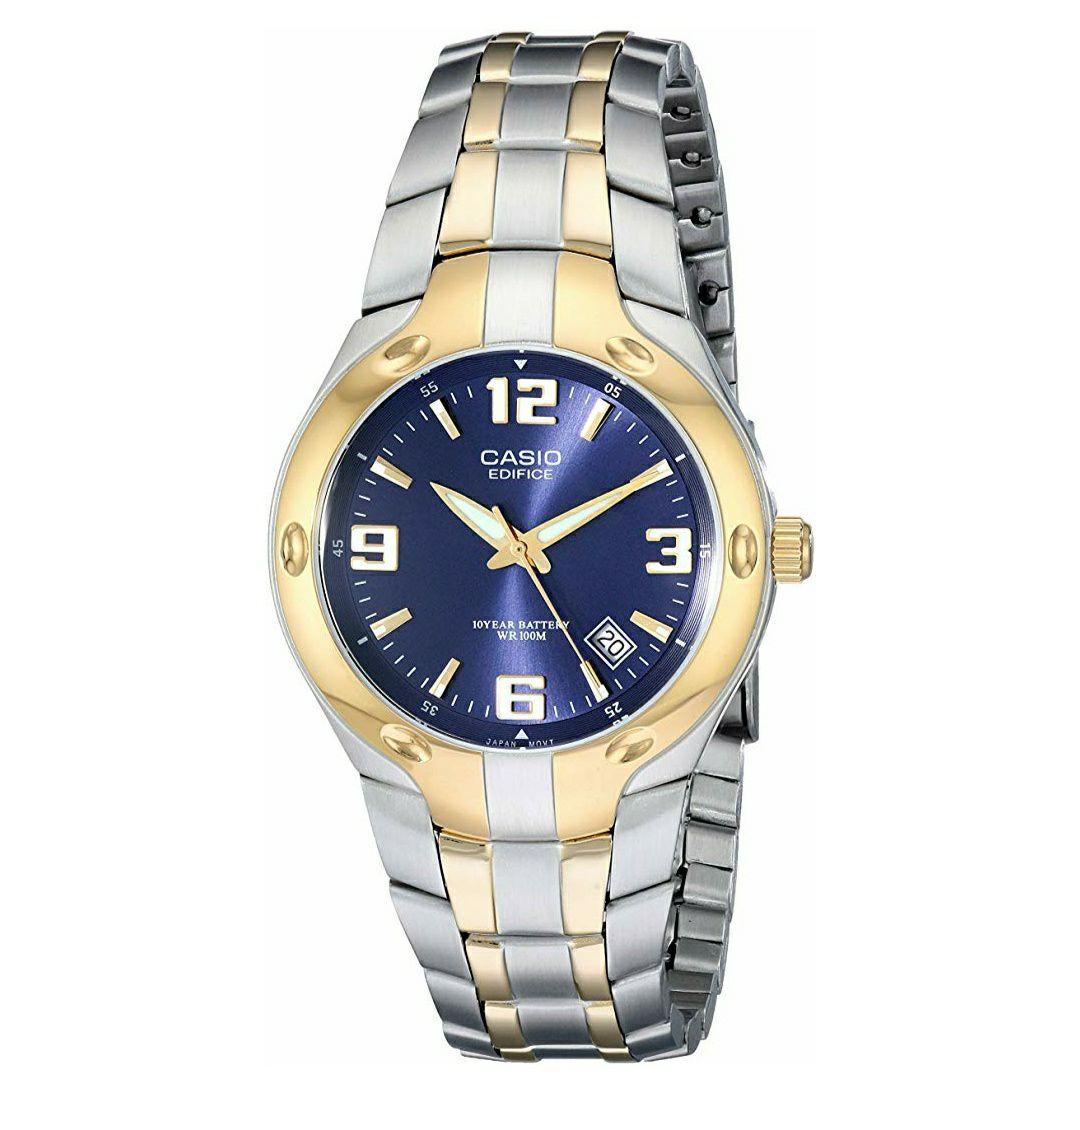 Amazon Mx: Reloj Casio Edifice Hombre EF106SG-2AV